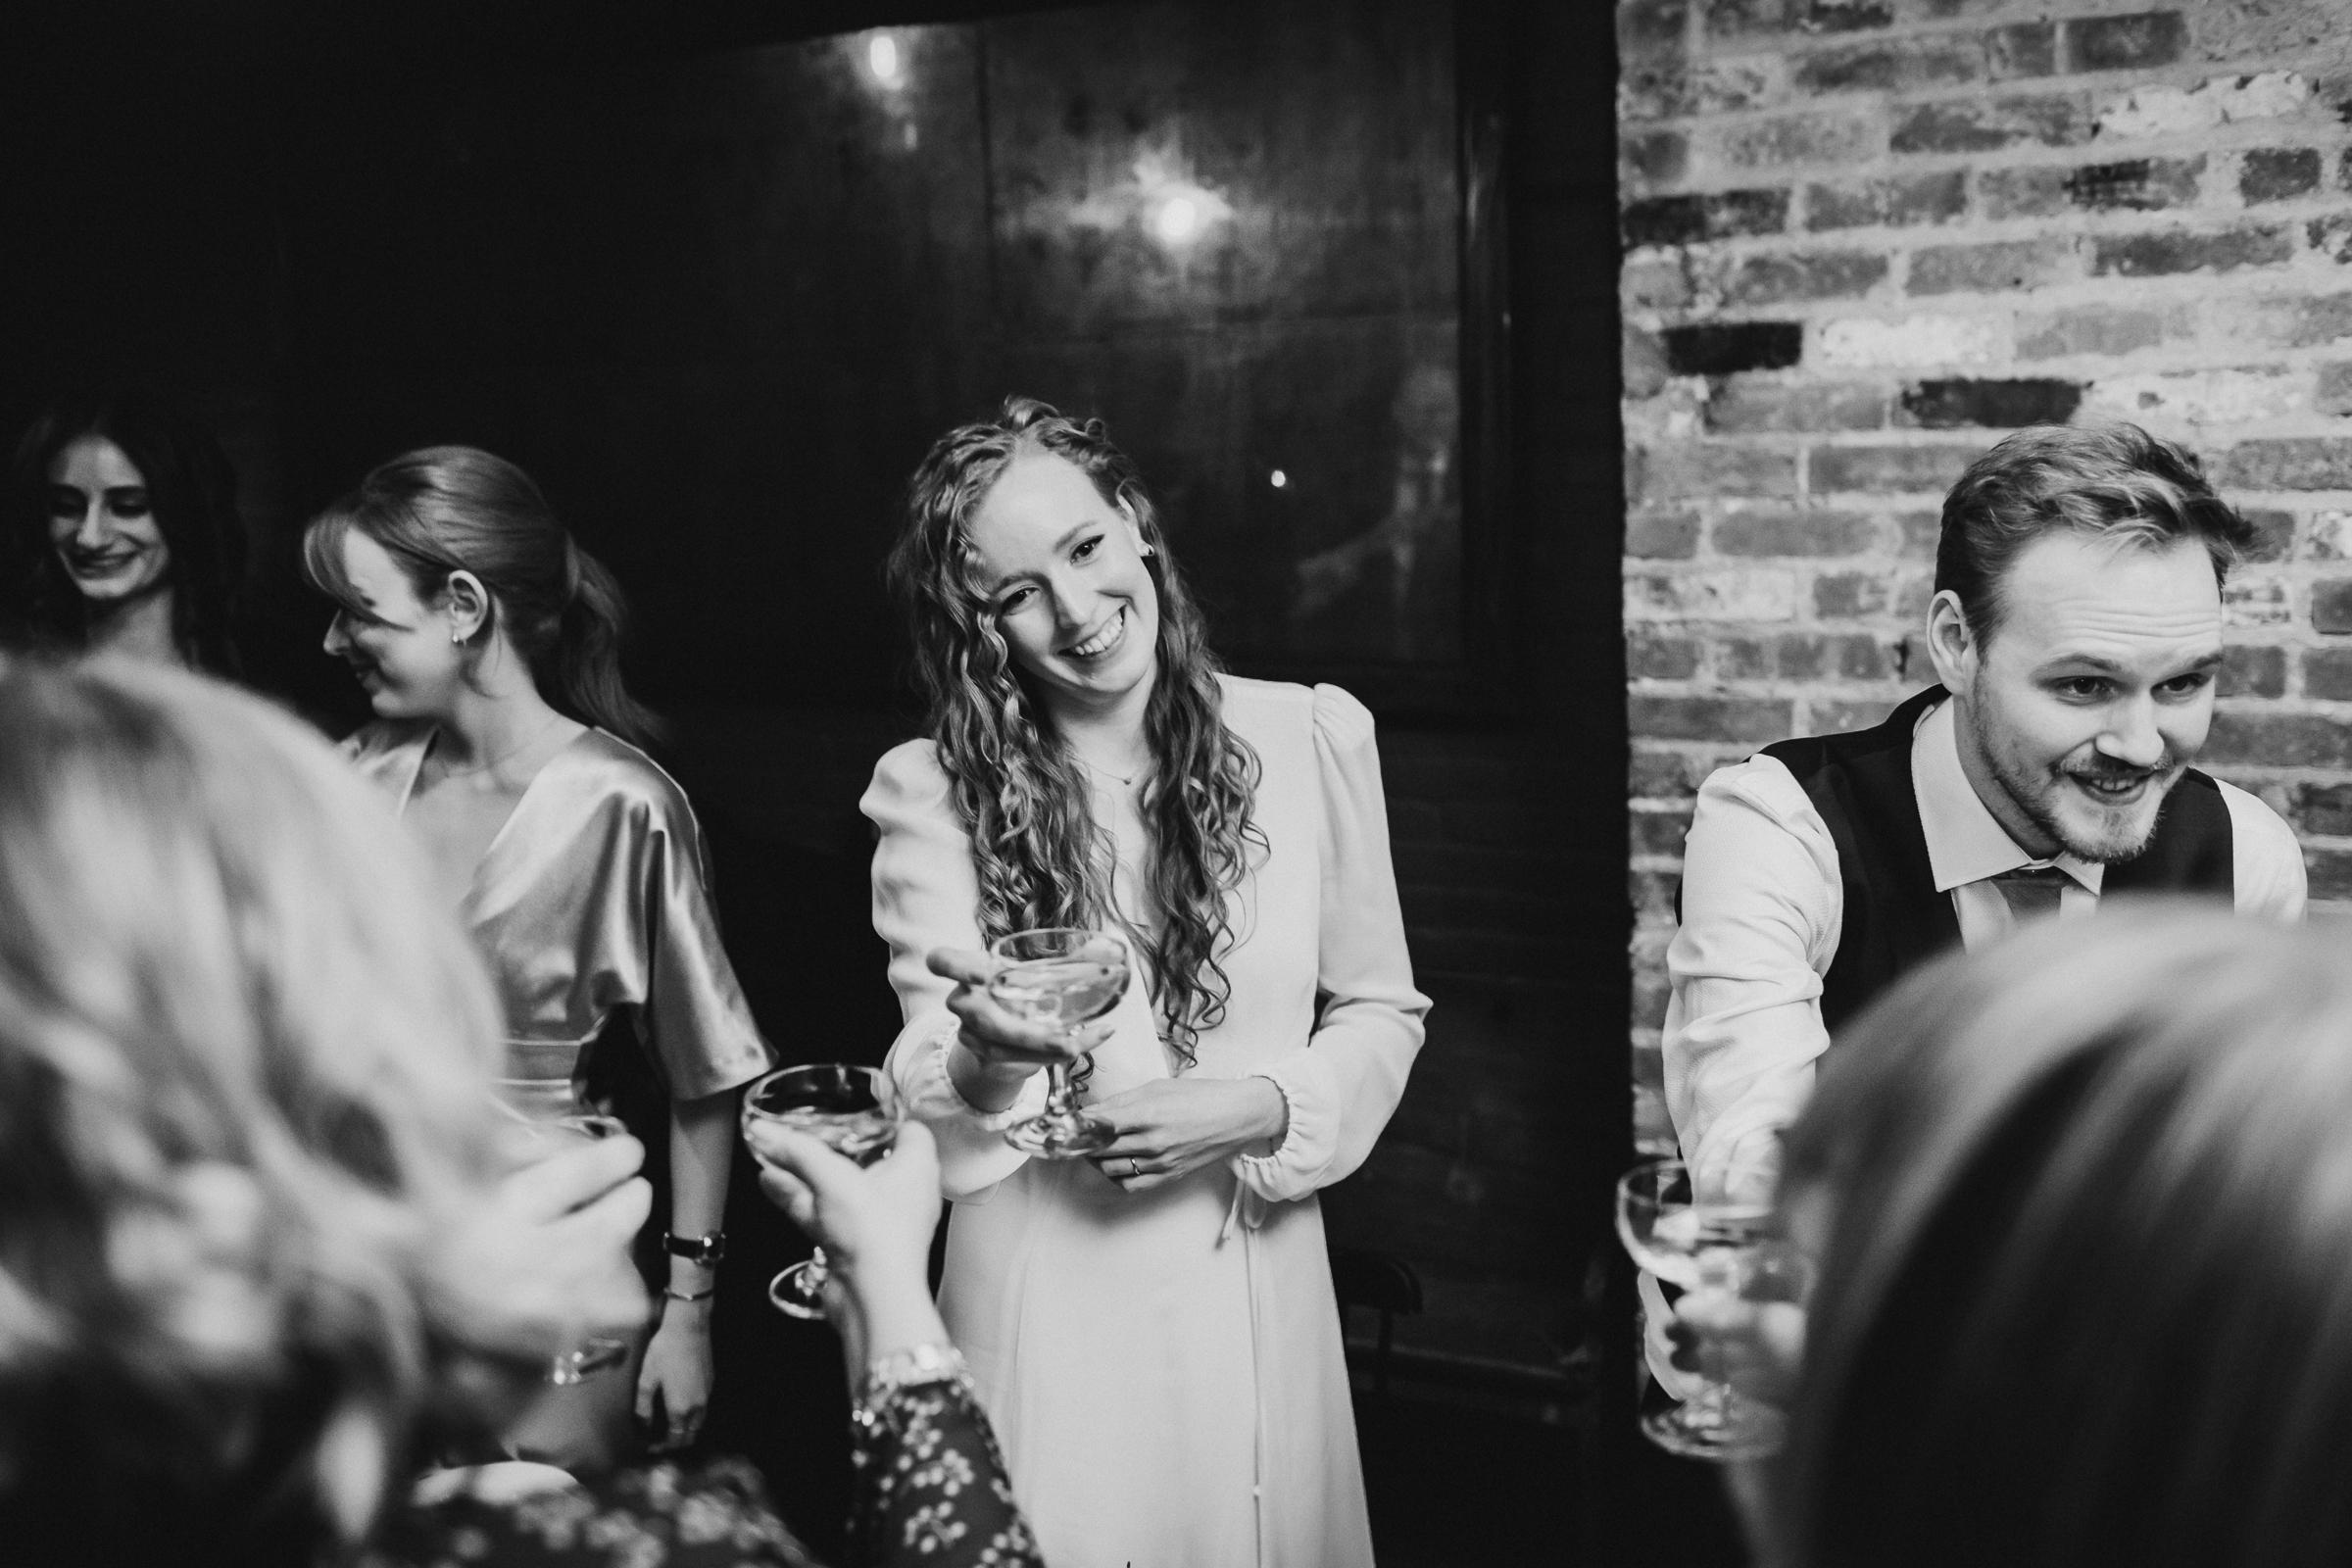 Freemans-Restaurant-Soho-Brooklyn-Bridge-Park-Dumbo-Documentary-Wedding-Photographer-66.jpg